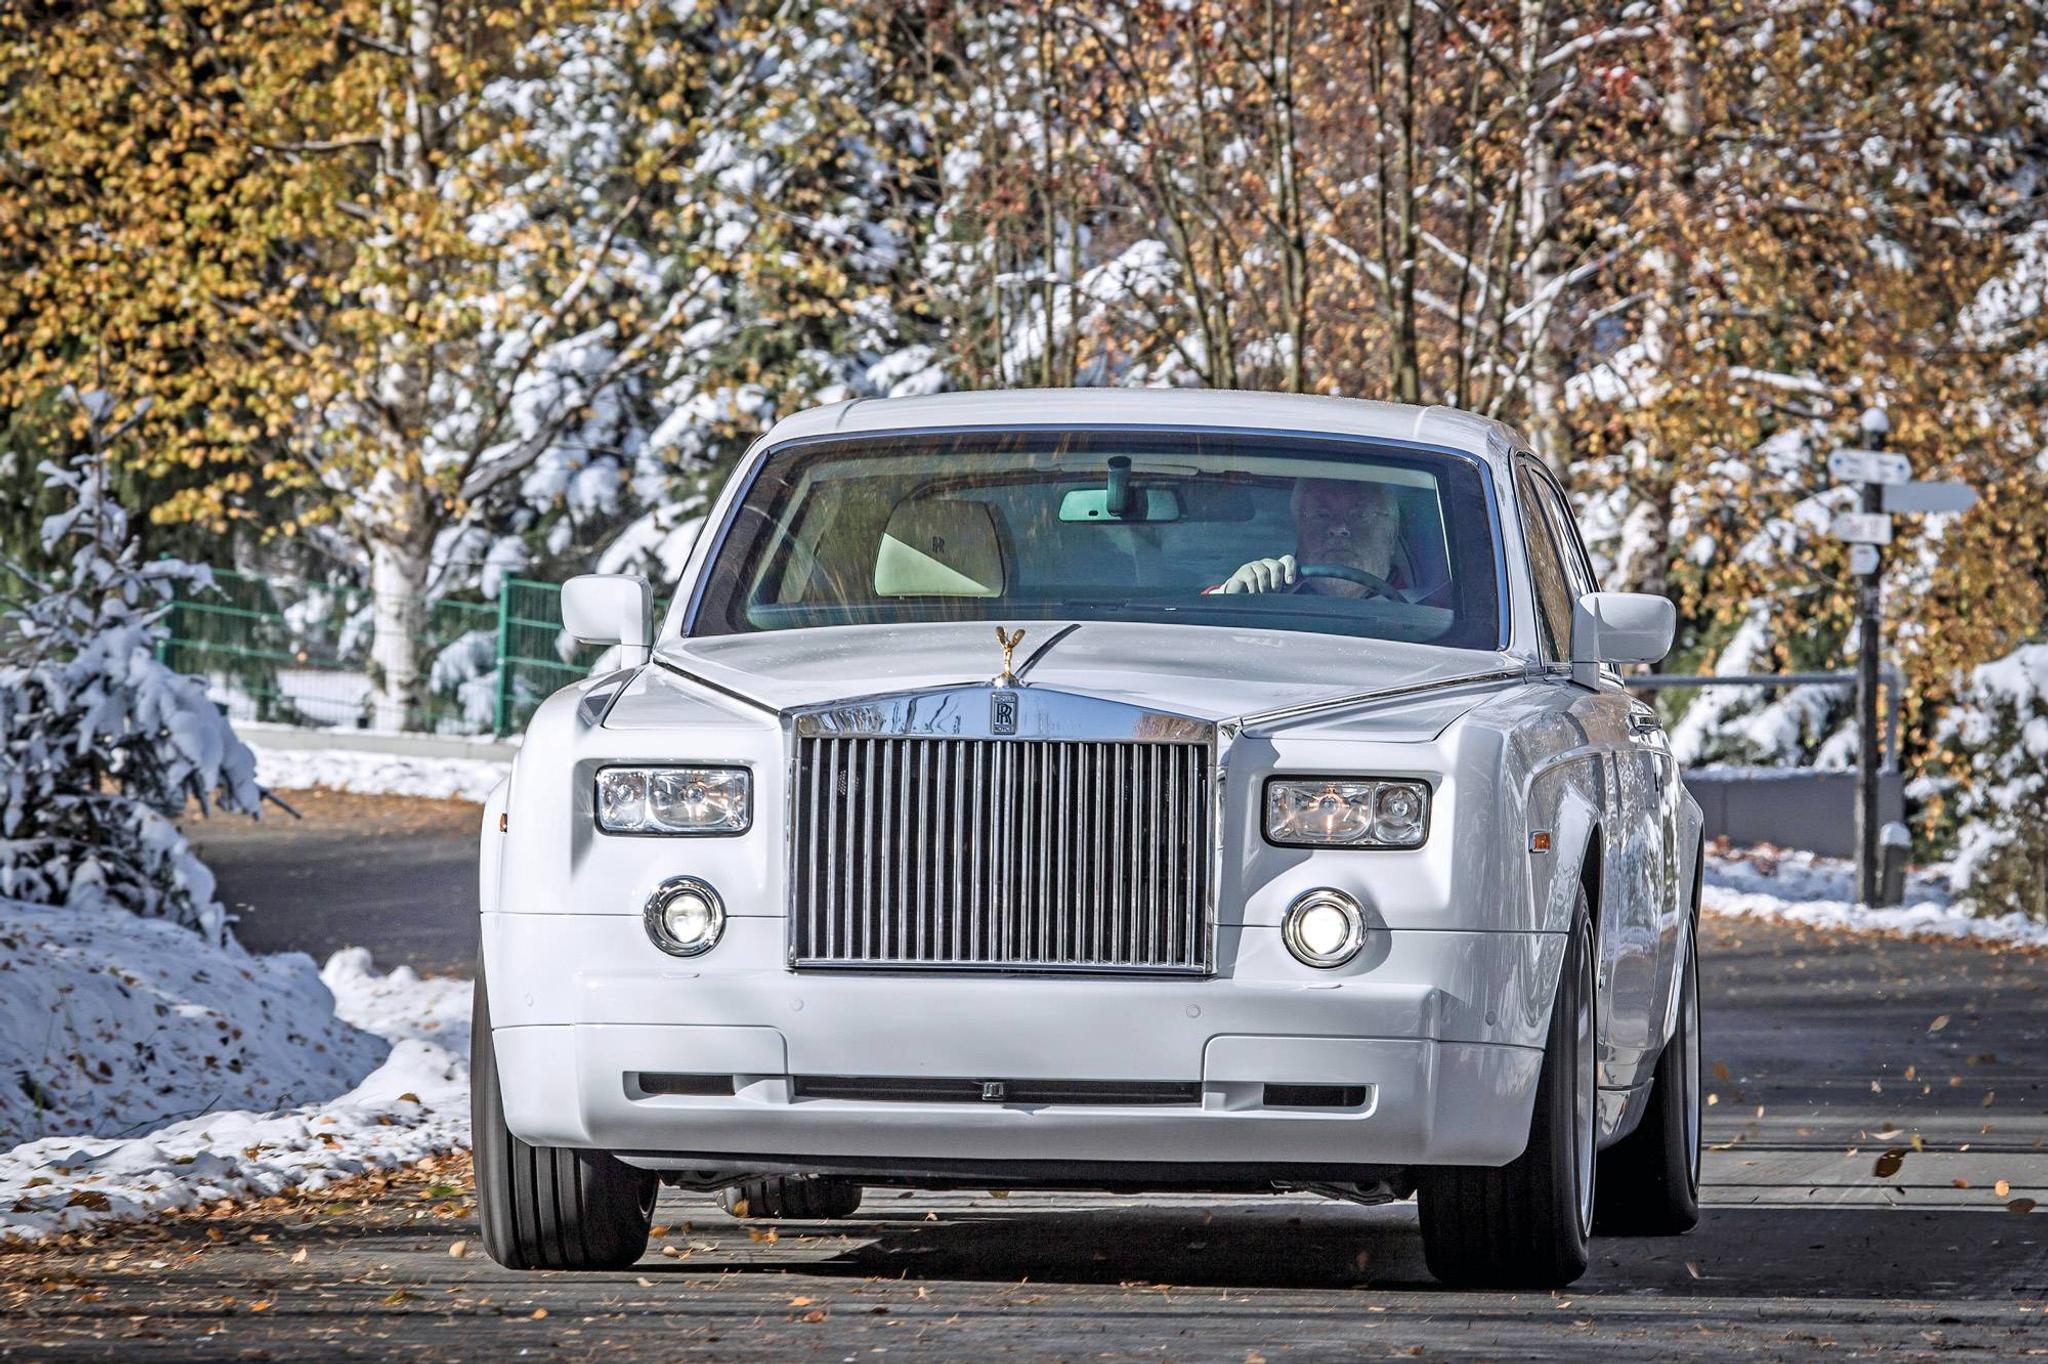 Rolls Royce Car >> Koeajossa Panssaroitu Rolls Royce Phantom Tuulilasi